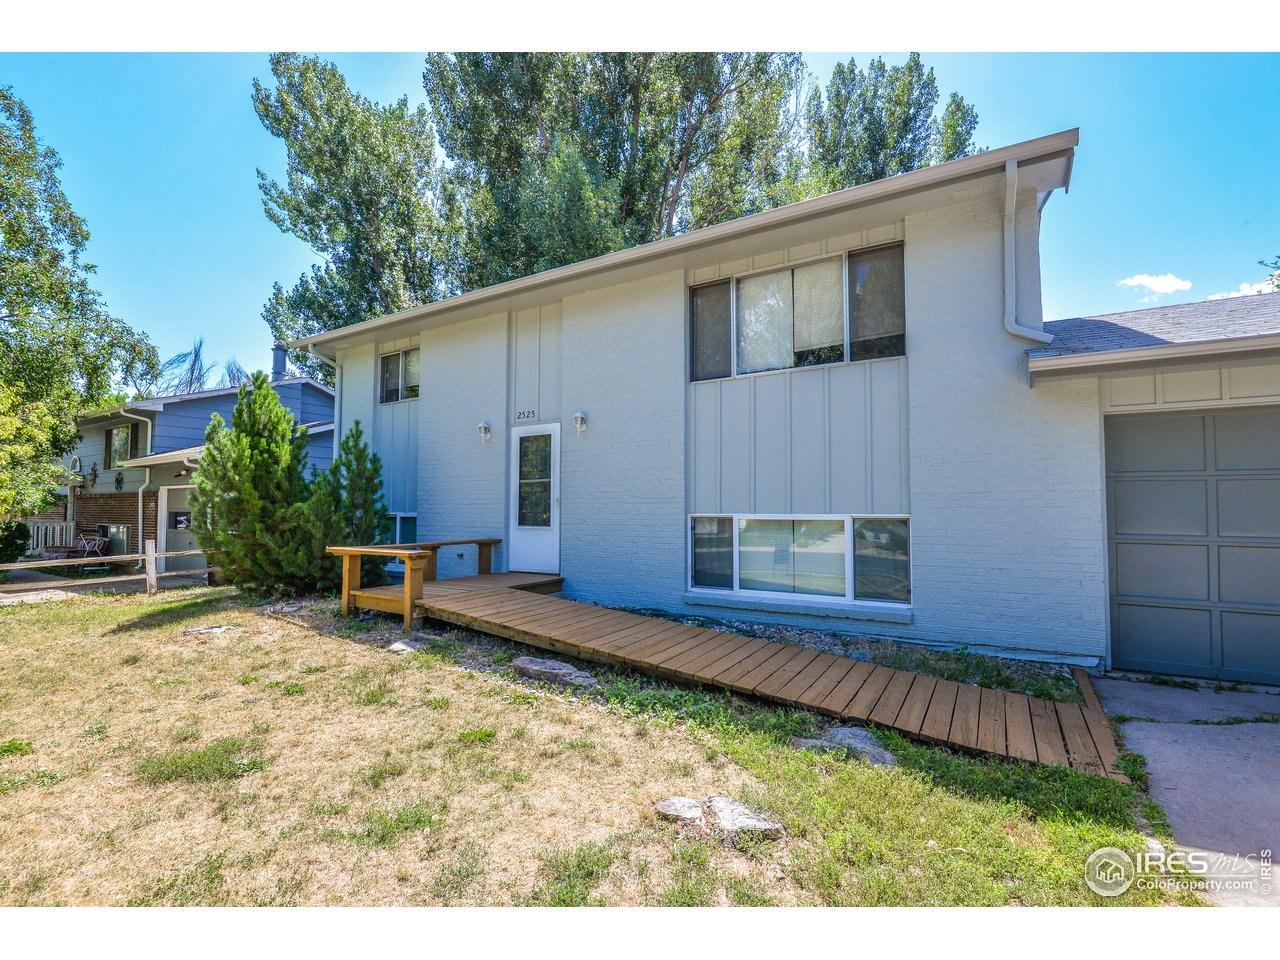 2525 W Laurel St, Fort Collins CO 80521